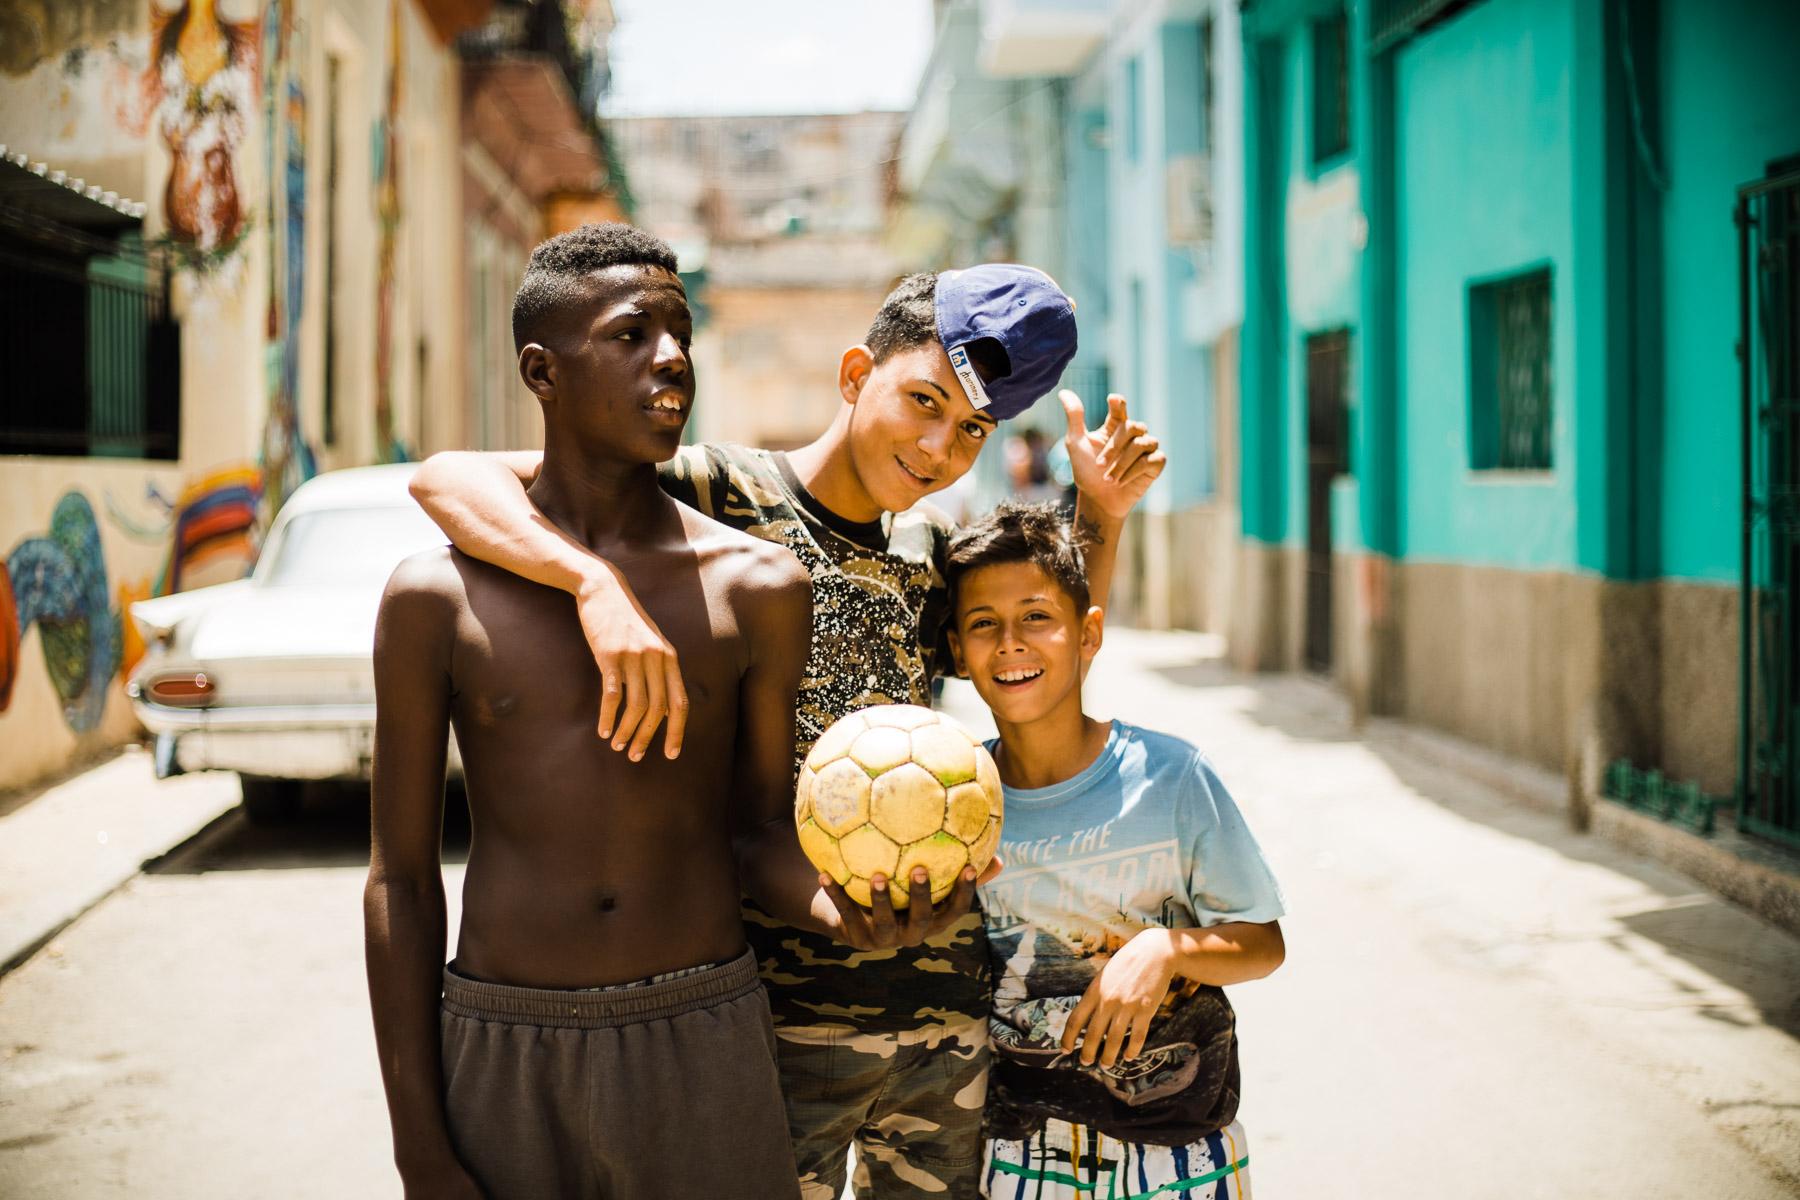 Cuba Streets_WEB-4.jpg